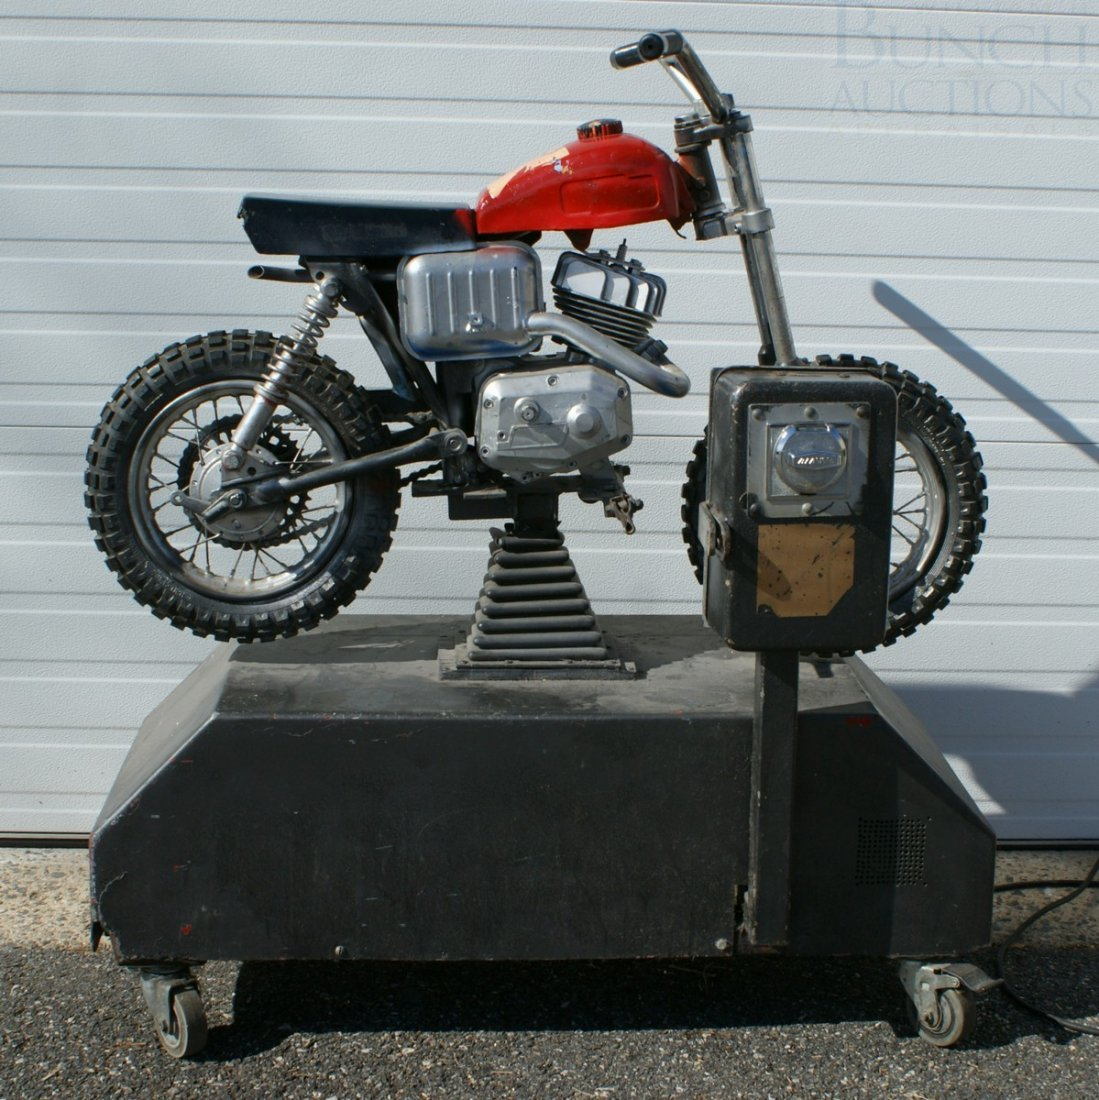 11: Italjet mini bike converted and mounted as a coin o